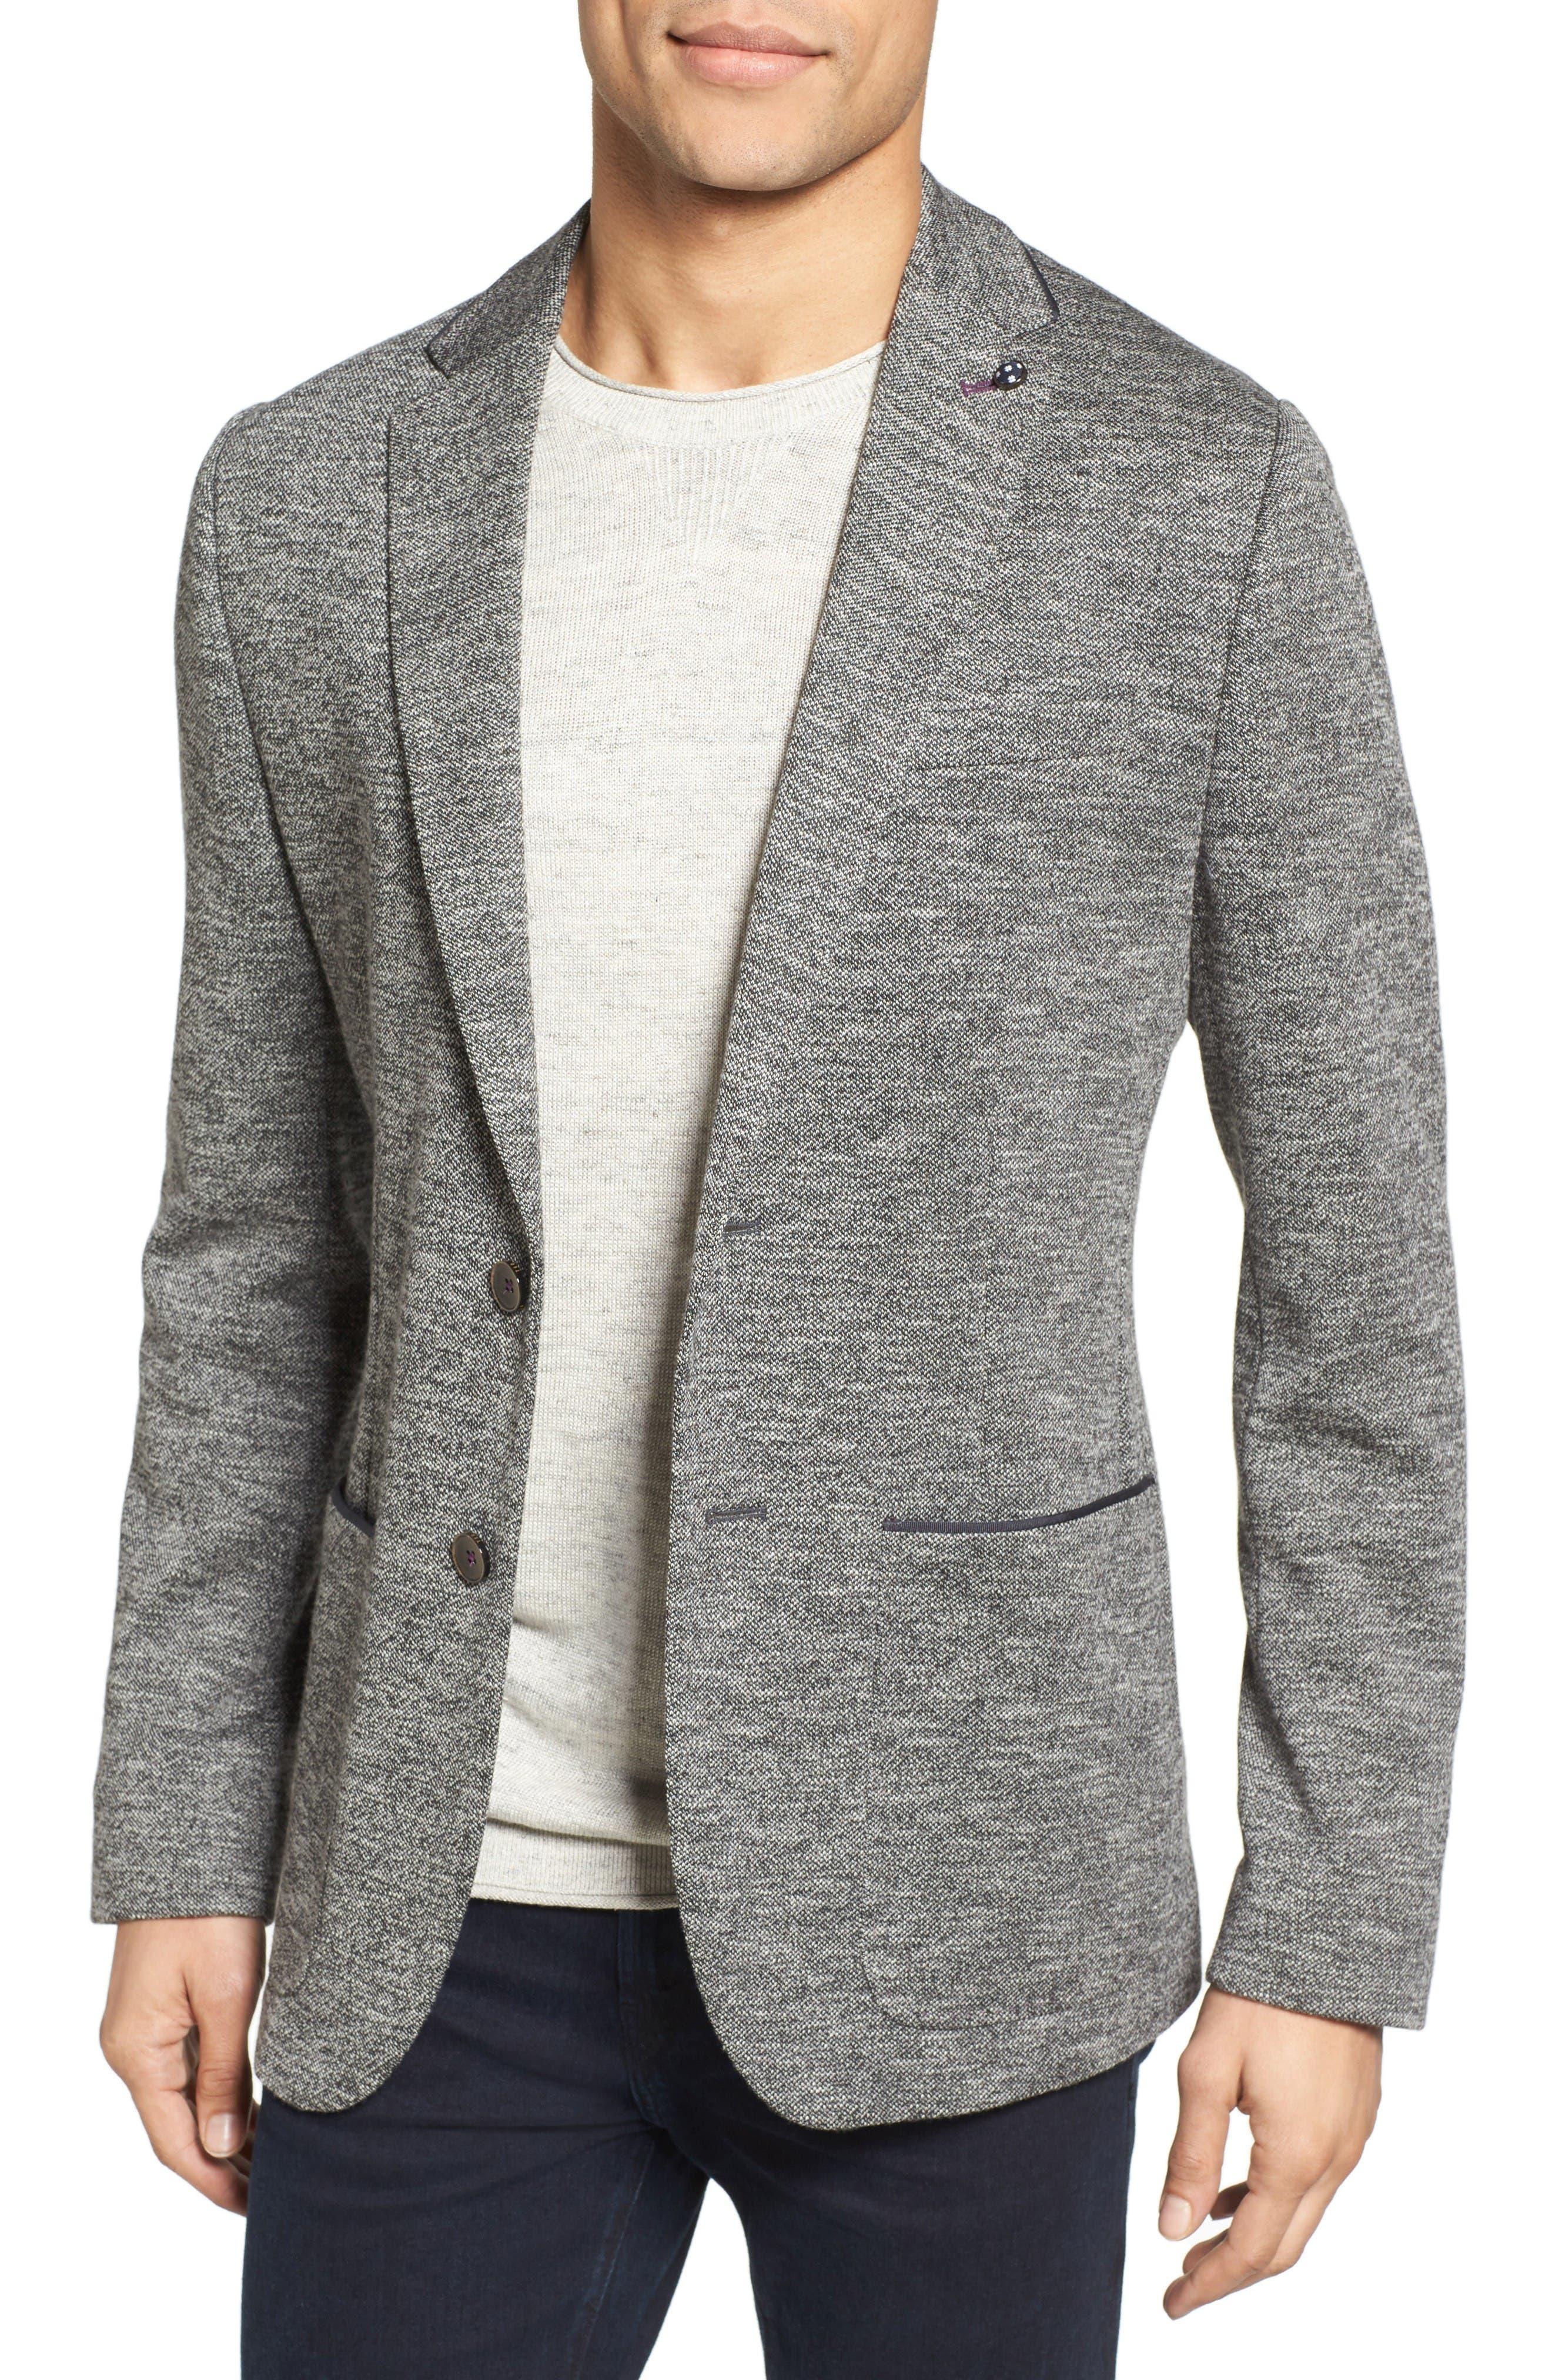 TED BAKER LONDON Italy Modern Slim Fit Textured Jersey Blazer